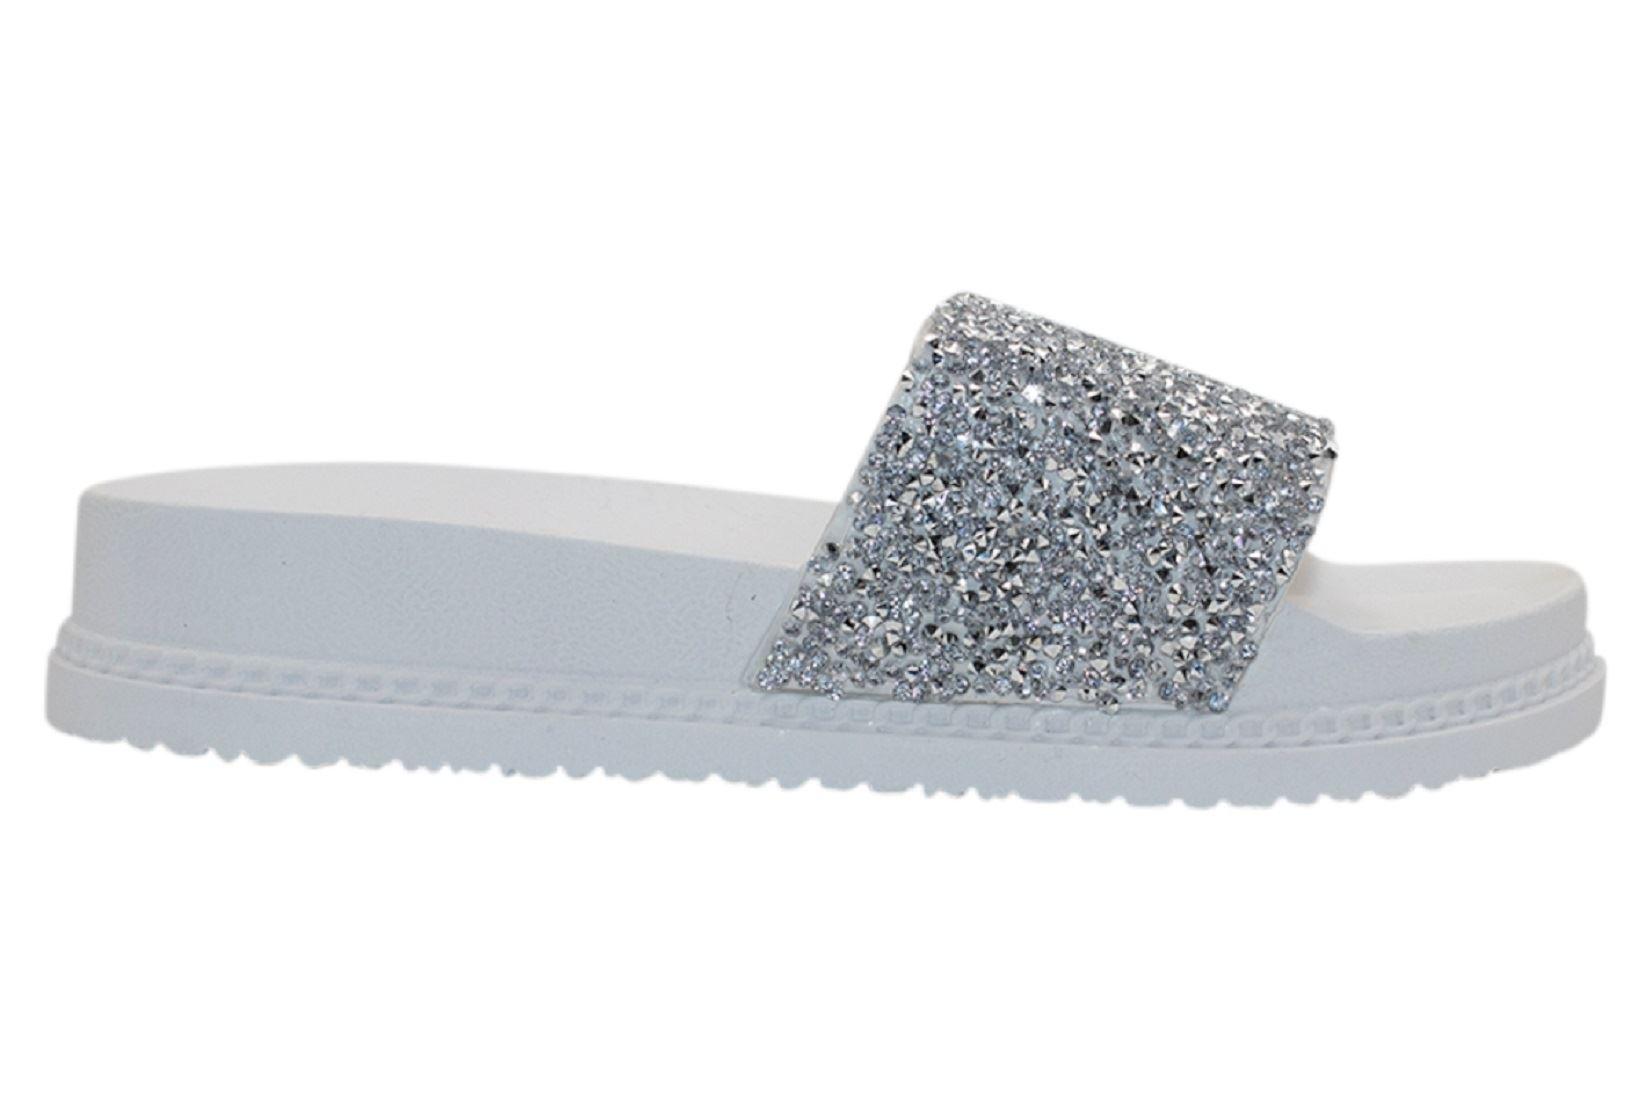 Womens-Sliders-Casual-Slippers-Mules-Ladies-Diamante-Flip-Flop-Sandals-Shoes thumbnail 82